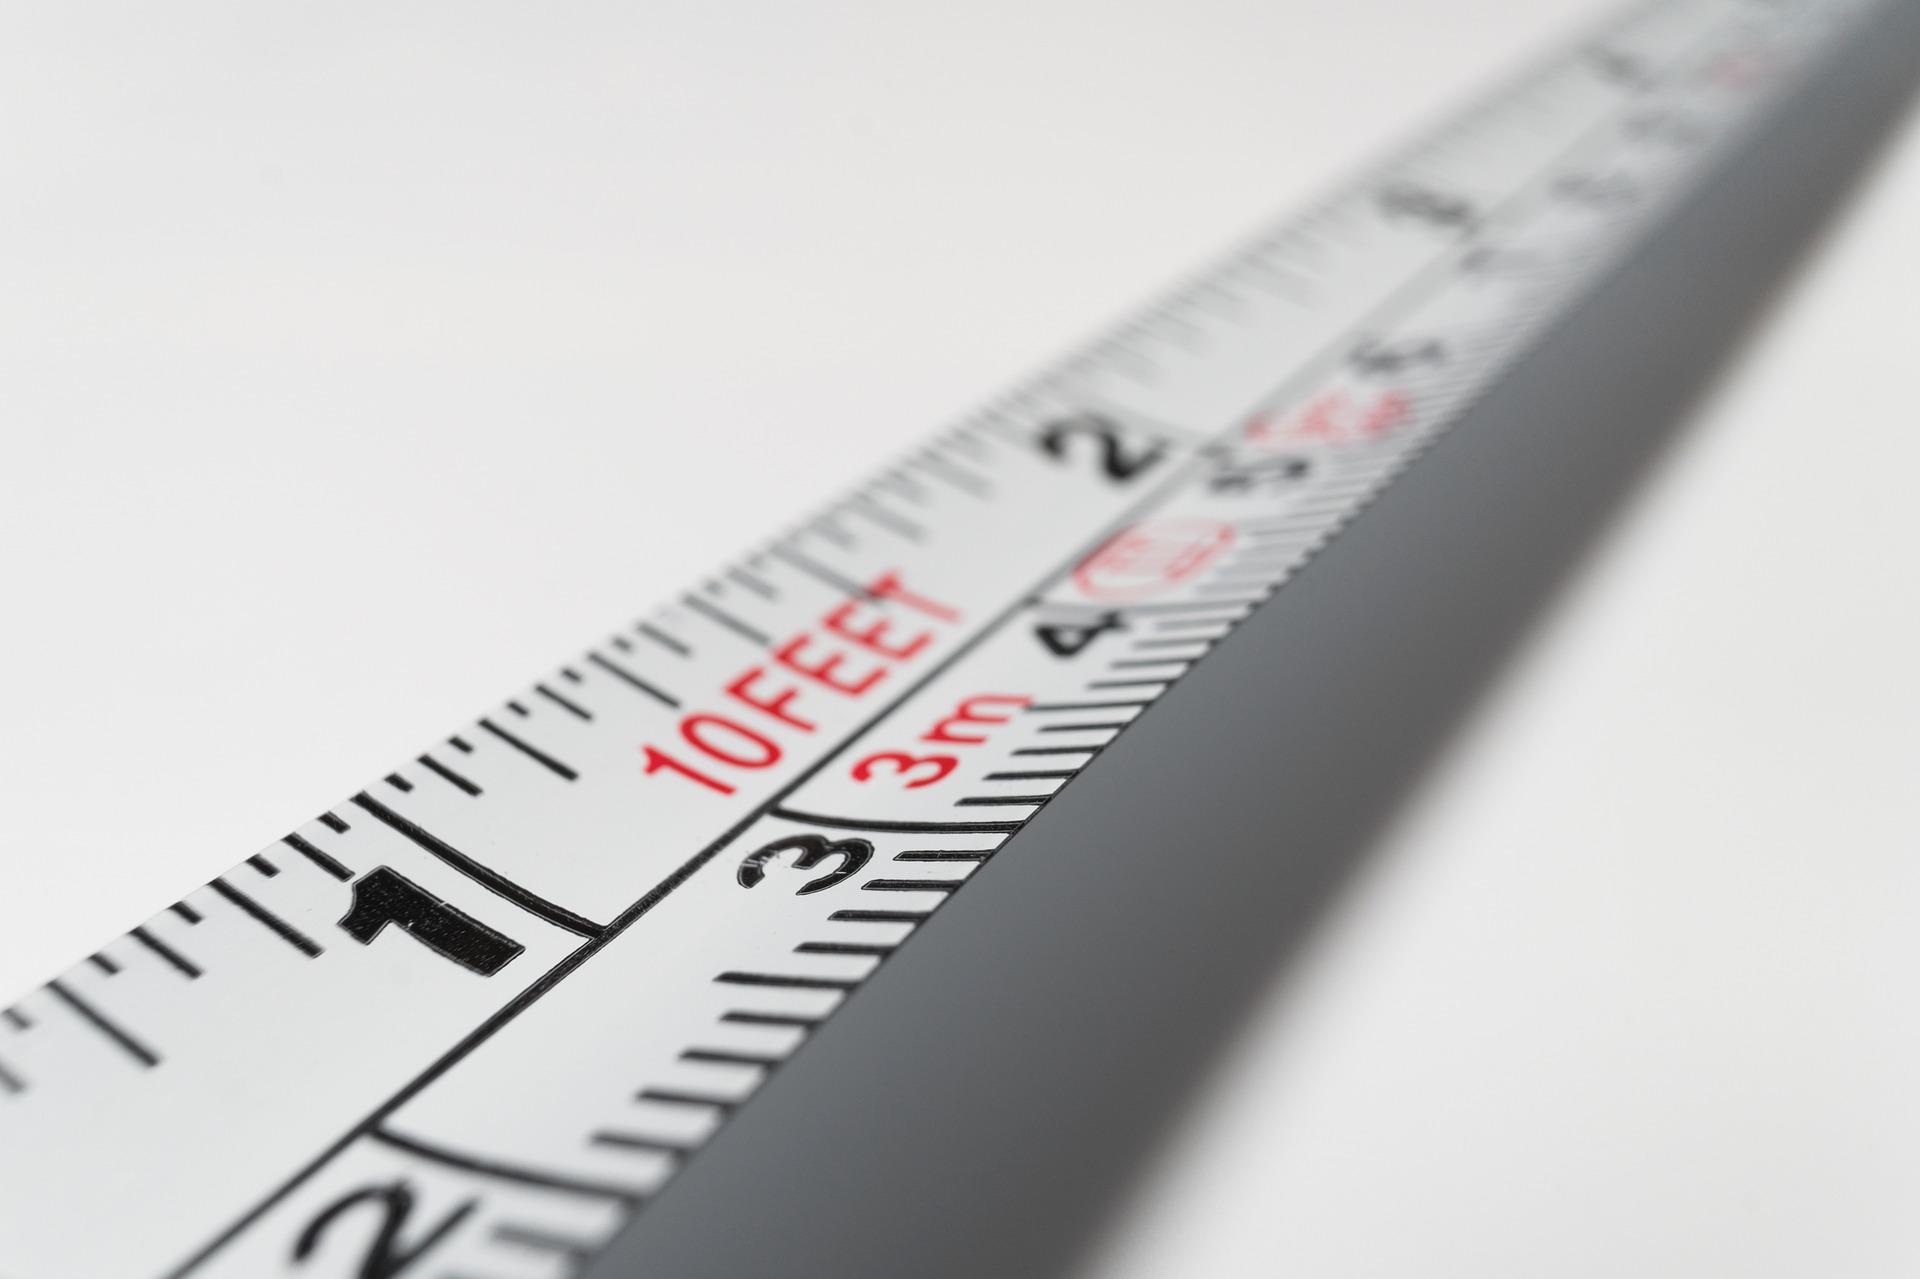 measurement tactics improving messaging engagement the reis rh thereisgroup com measurements deutsch measurement system analysis pdf